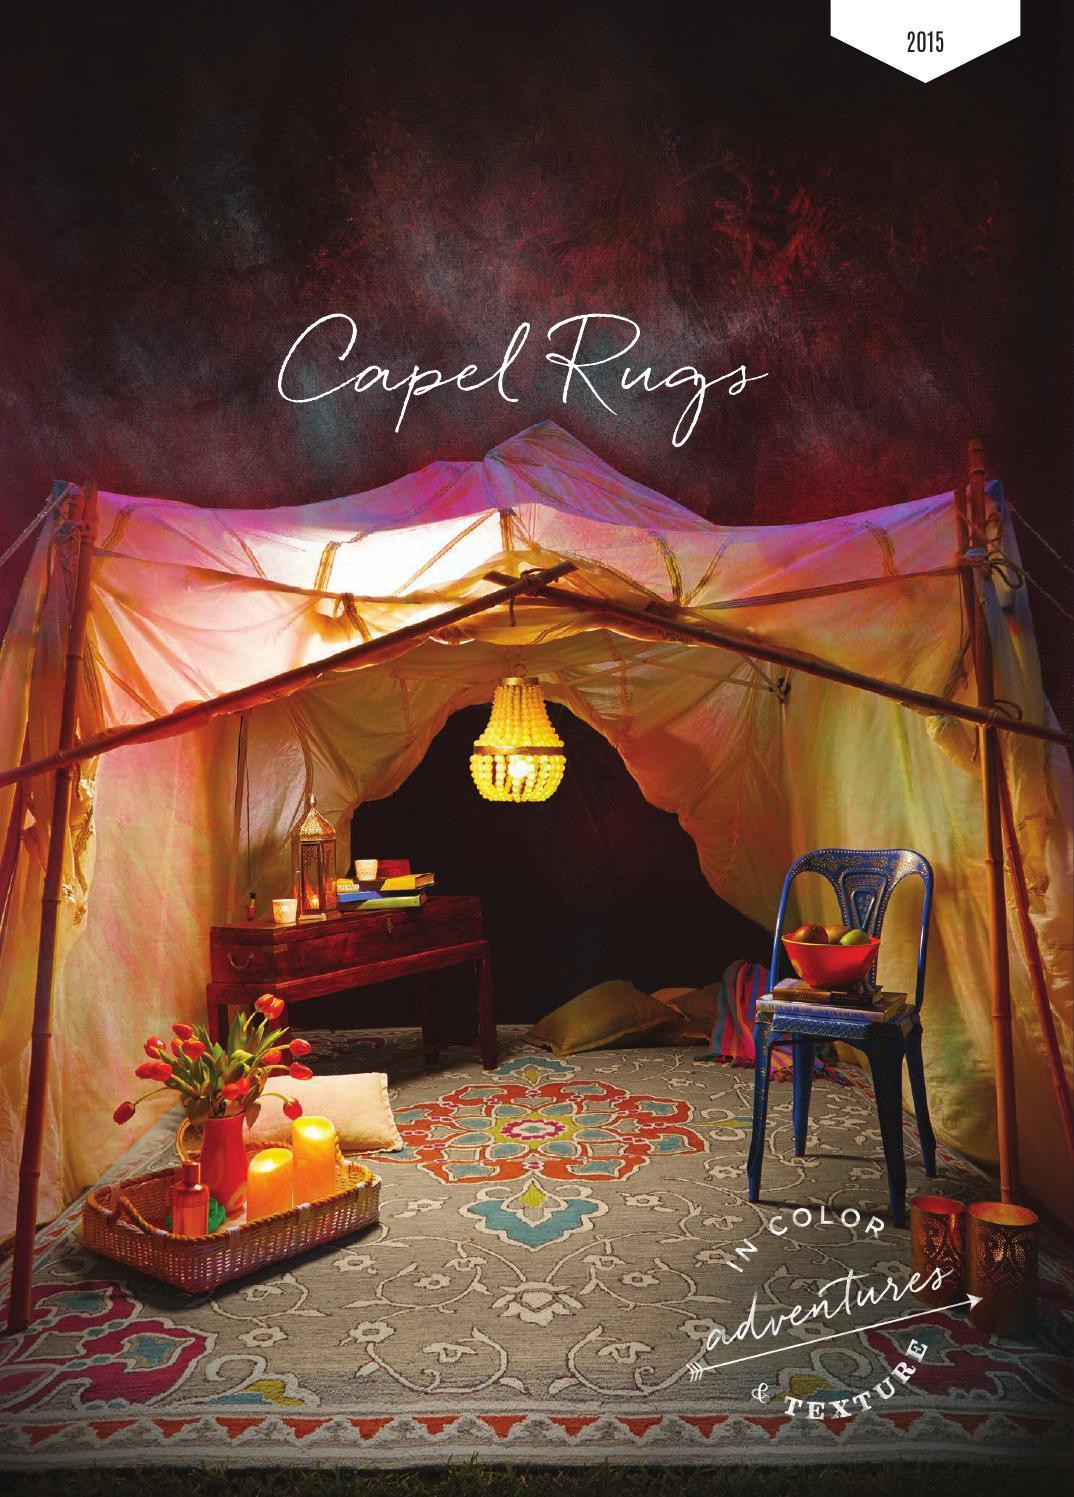 359c166c8ea4f Capel Rugs 2015 Catalog by Capel Rugs - issuu